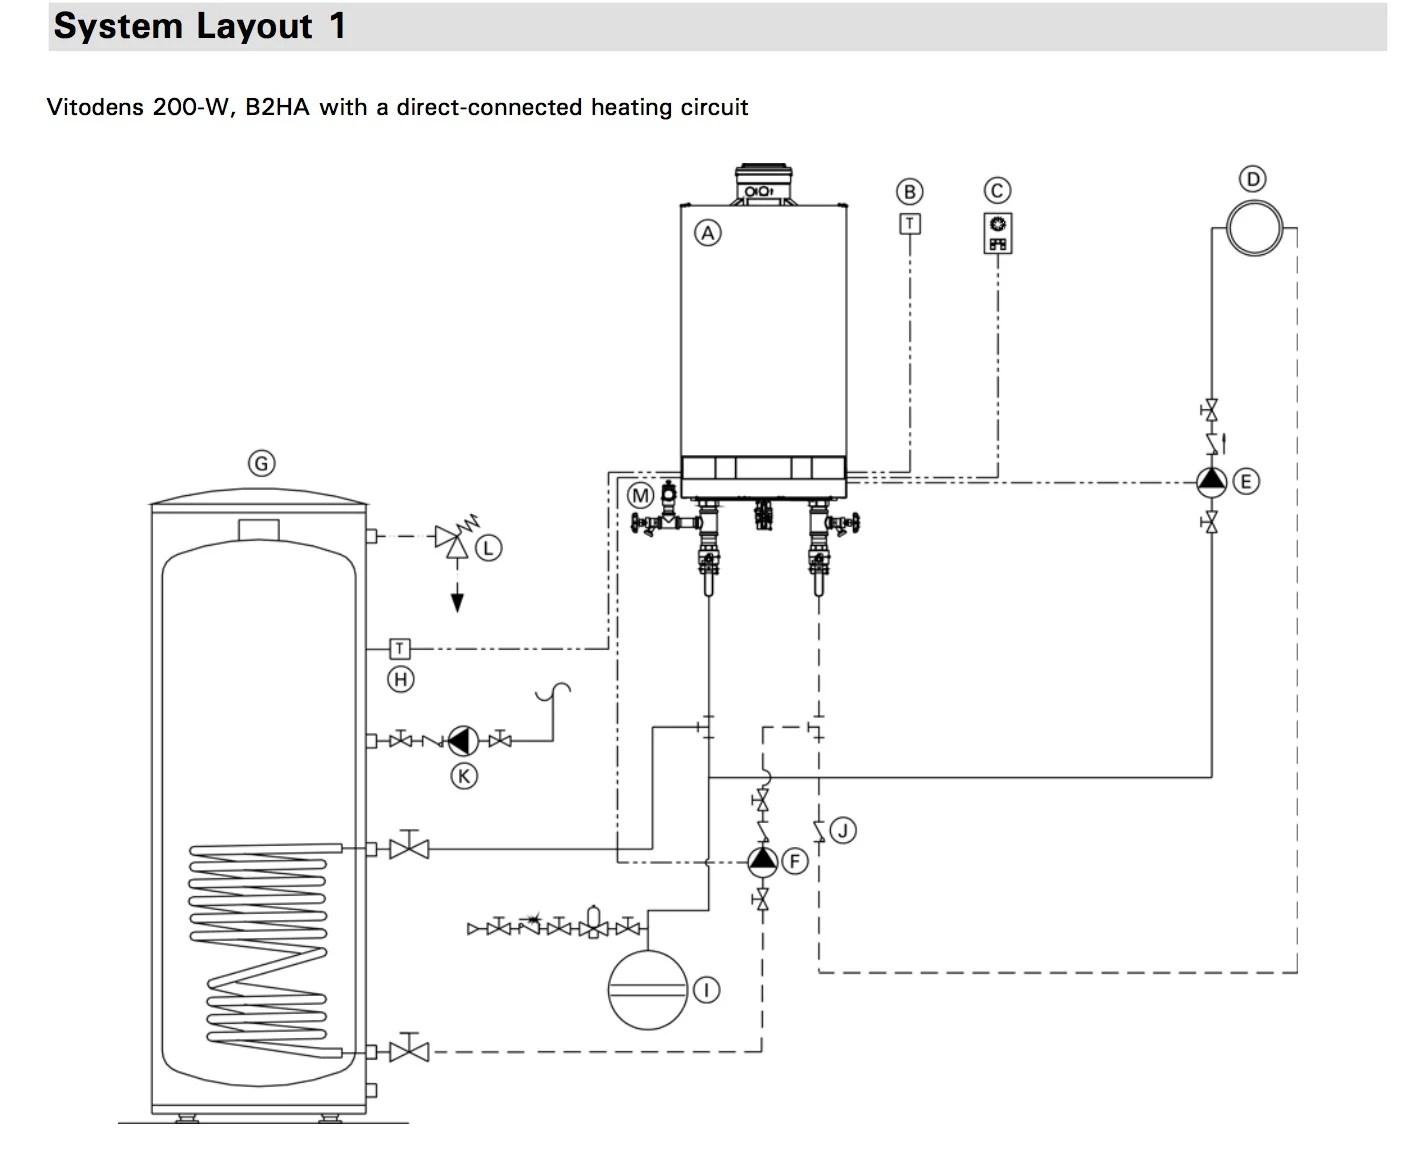 viessmann boiler wiring diagrams car horn relay diagram 2 piping file pi73097 system